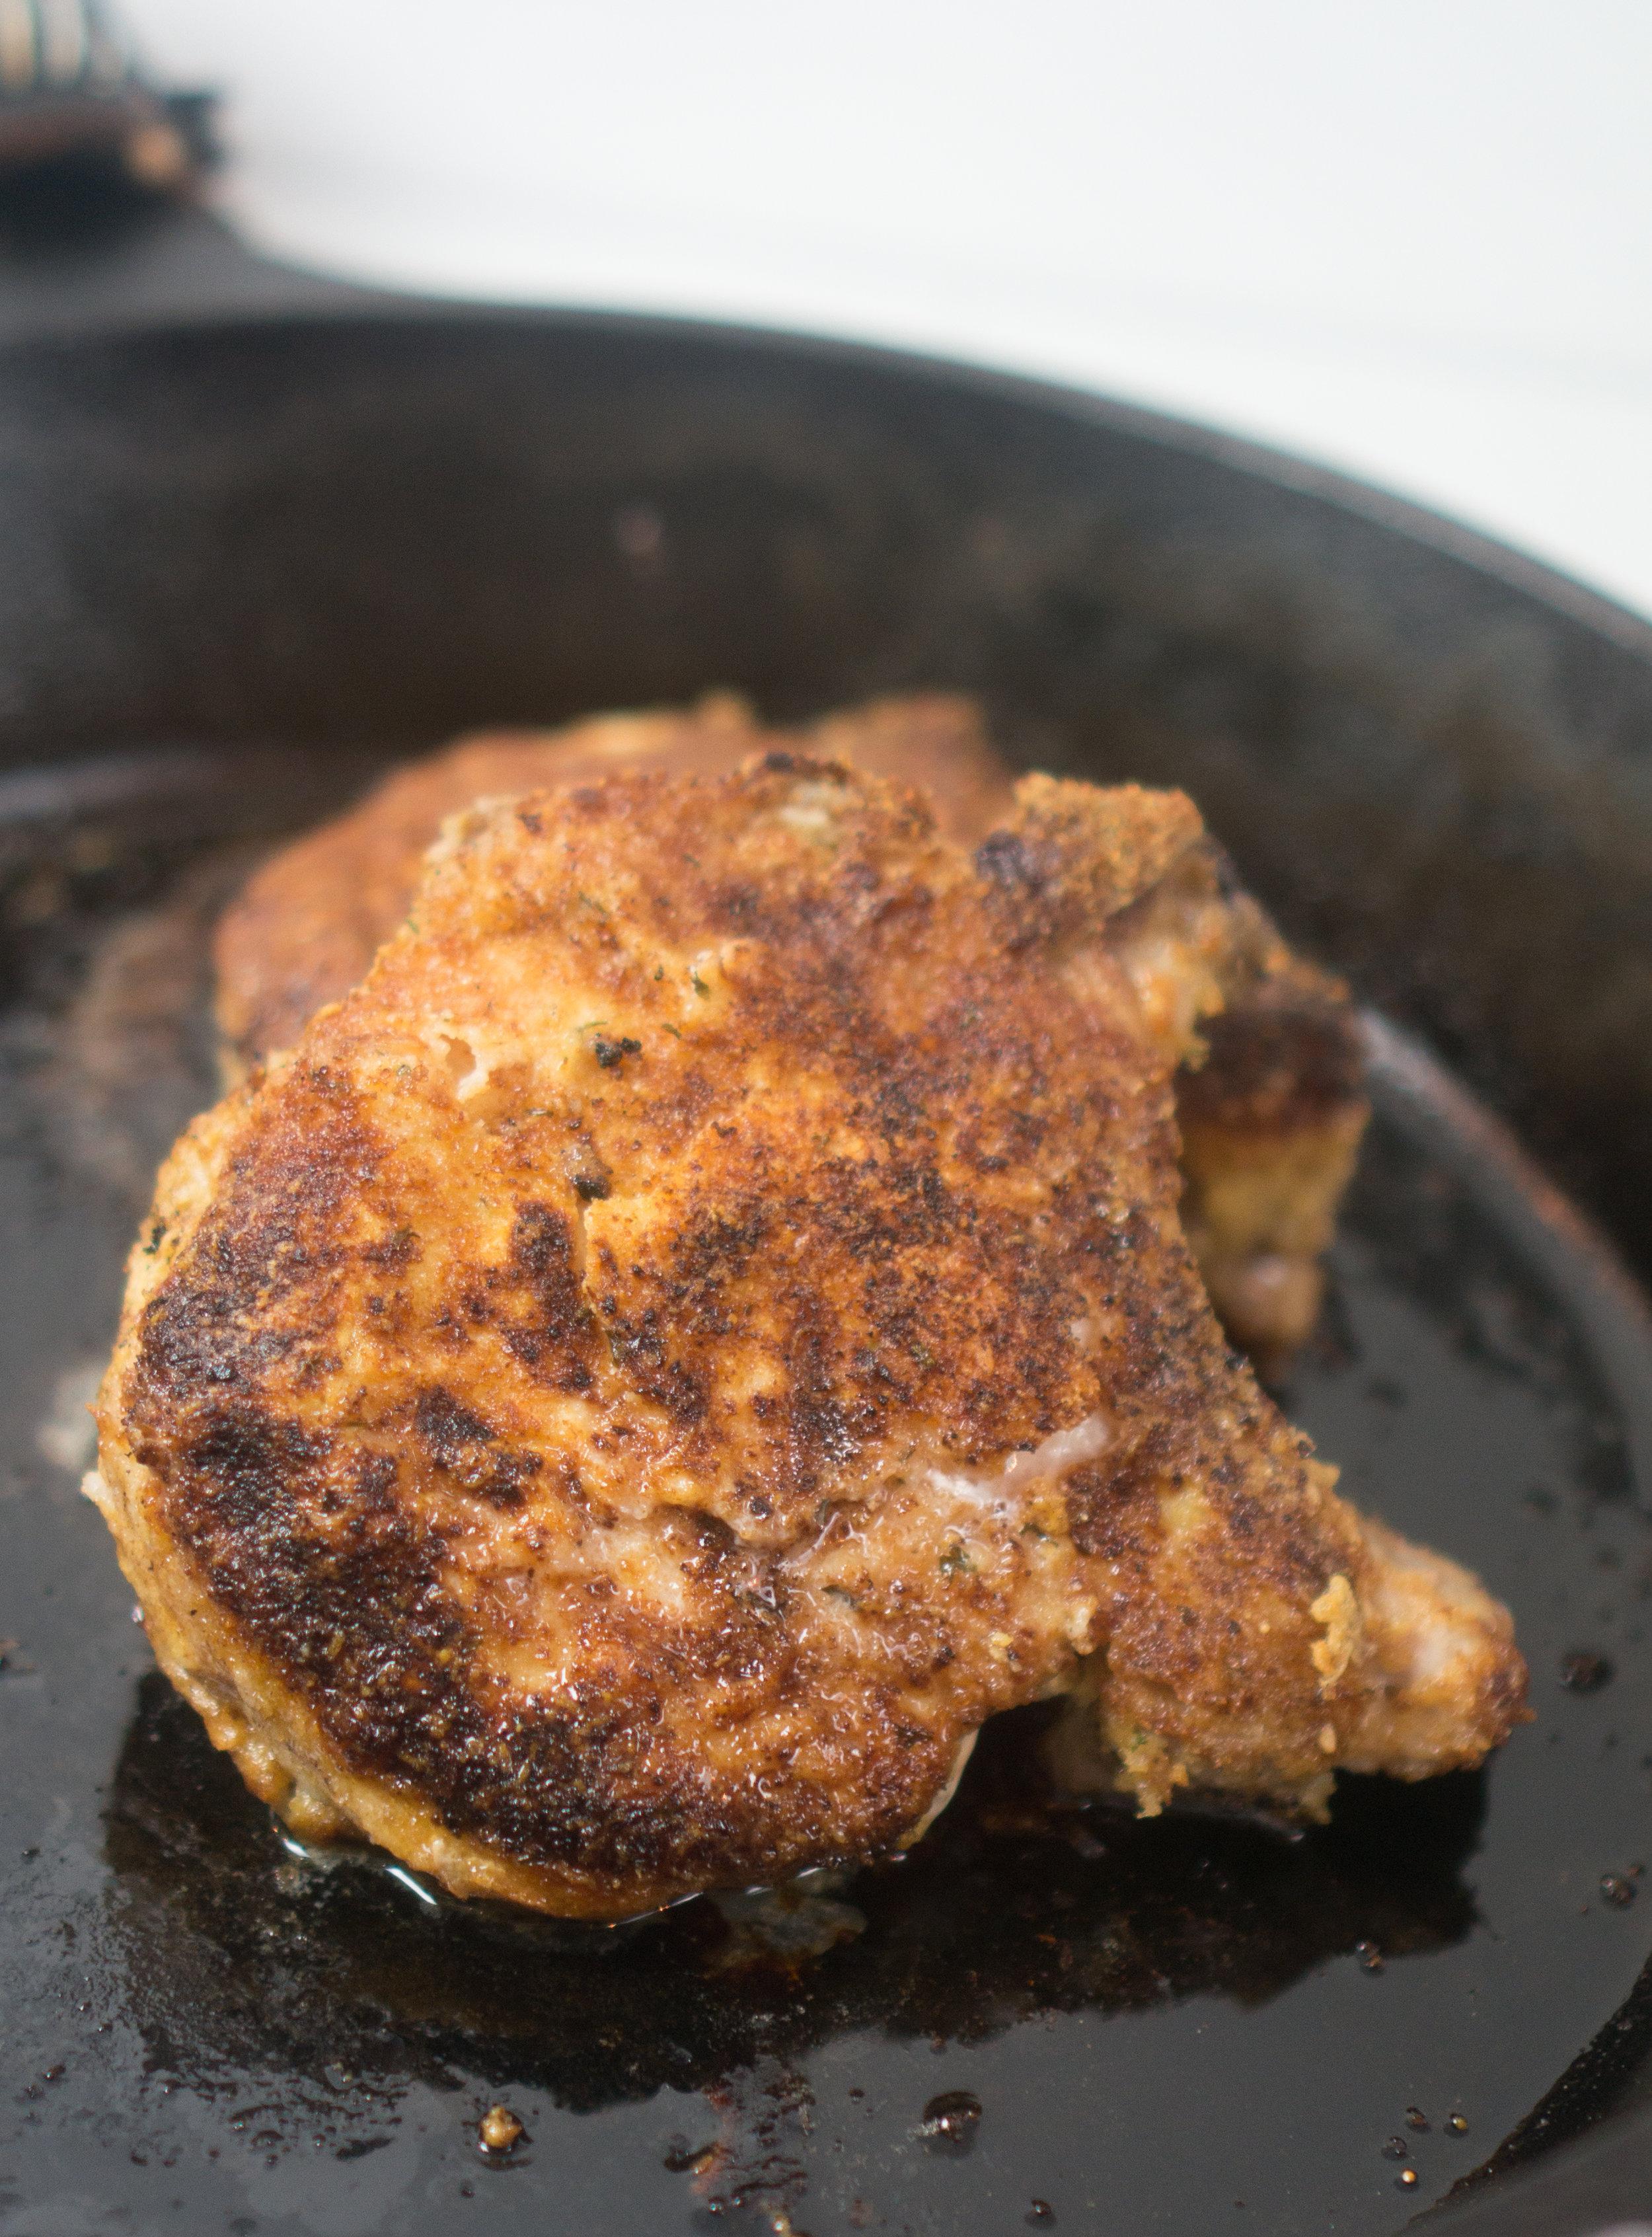 easy cast iron skillet pork chop recipe | Oven Baked Breaded Pork Chops